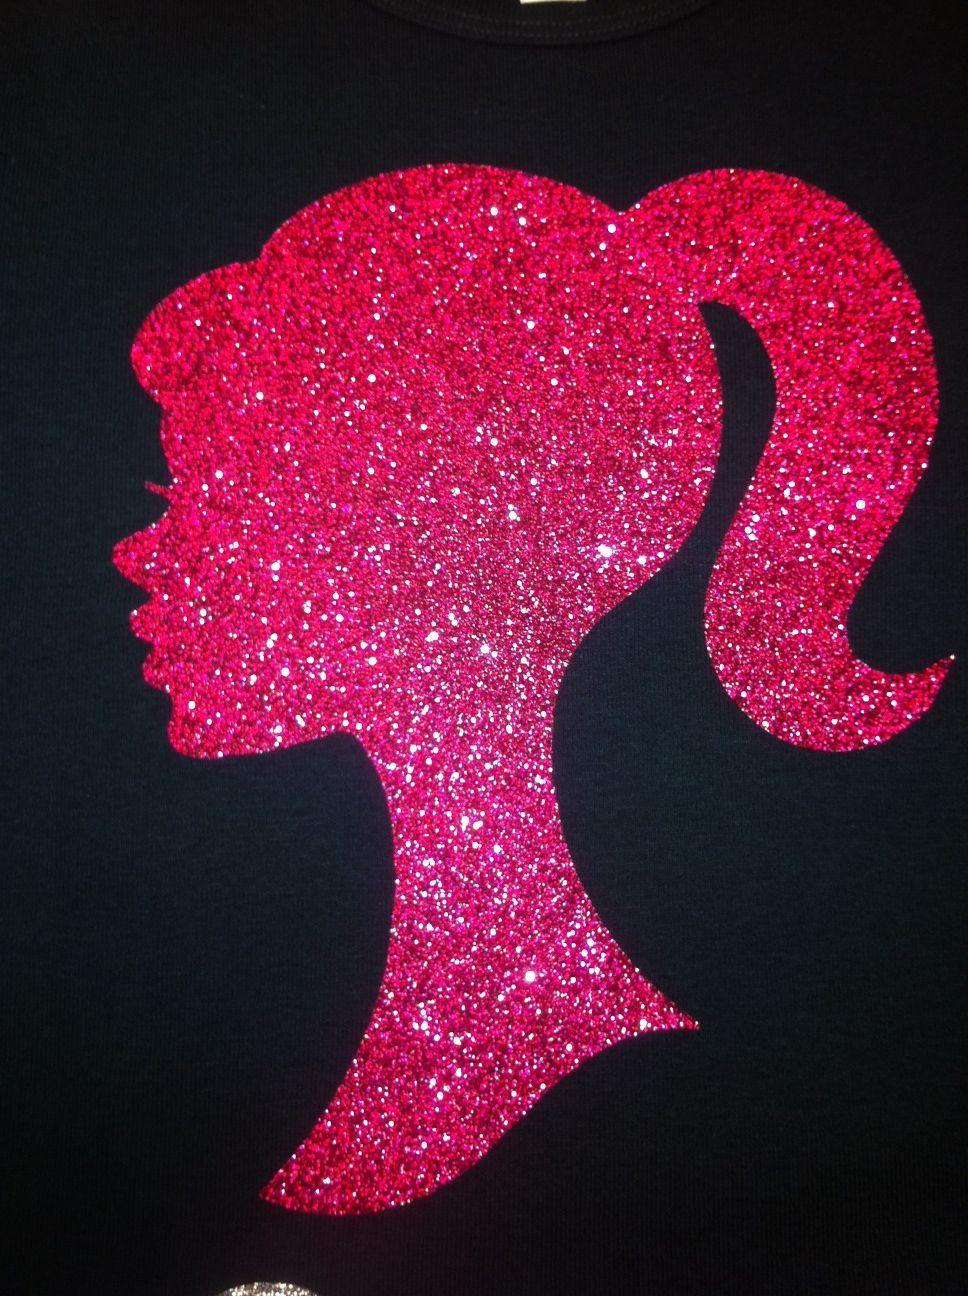 Custom Barbie Silhouette Shirt In Glitter For Princess Or Birthday Girl Party 1699 Via